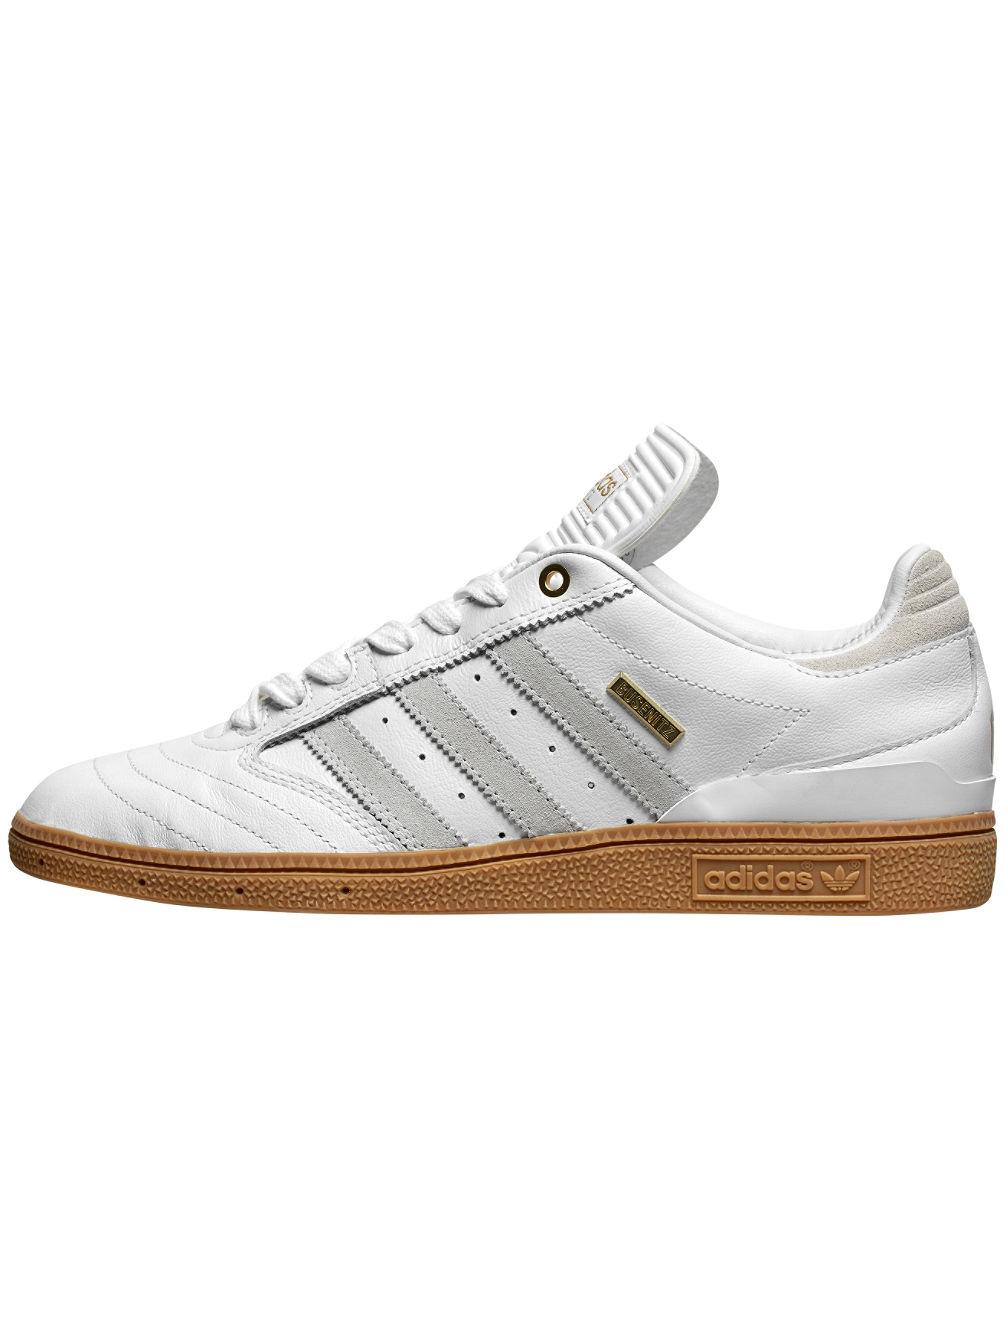 adidas-skateboarding-busenitz-10-yr-anniversary-skate-shoes